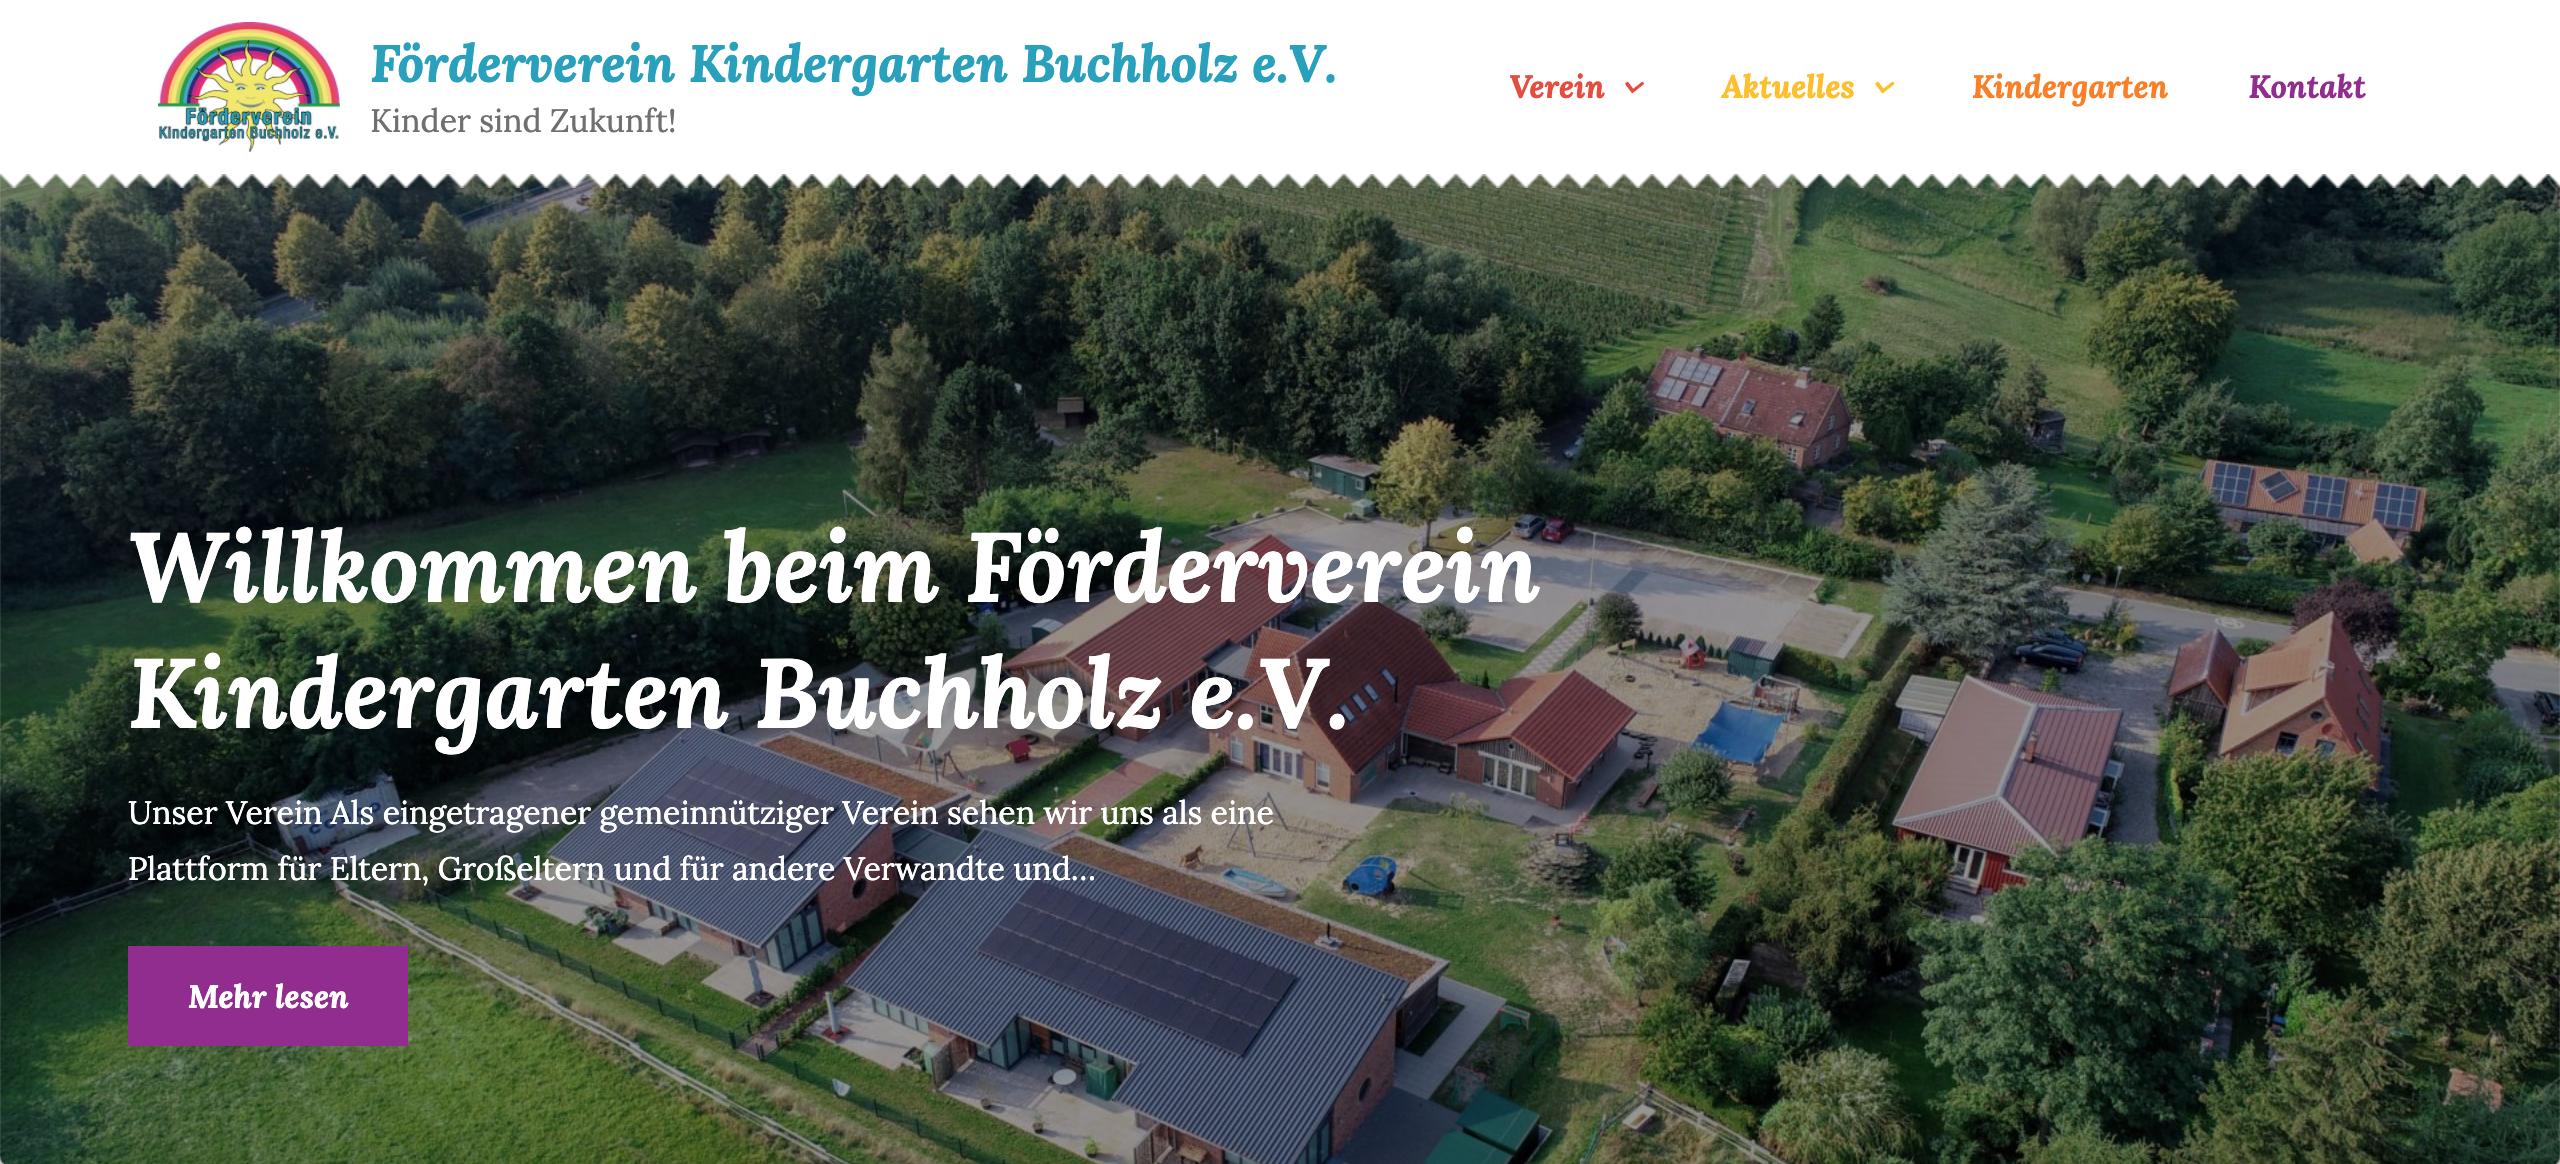 Kindergarten-buchholz-foerdern.de